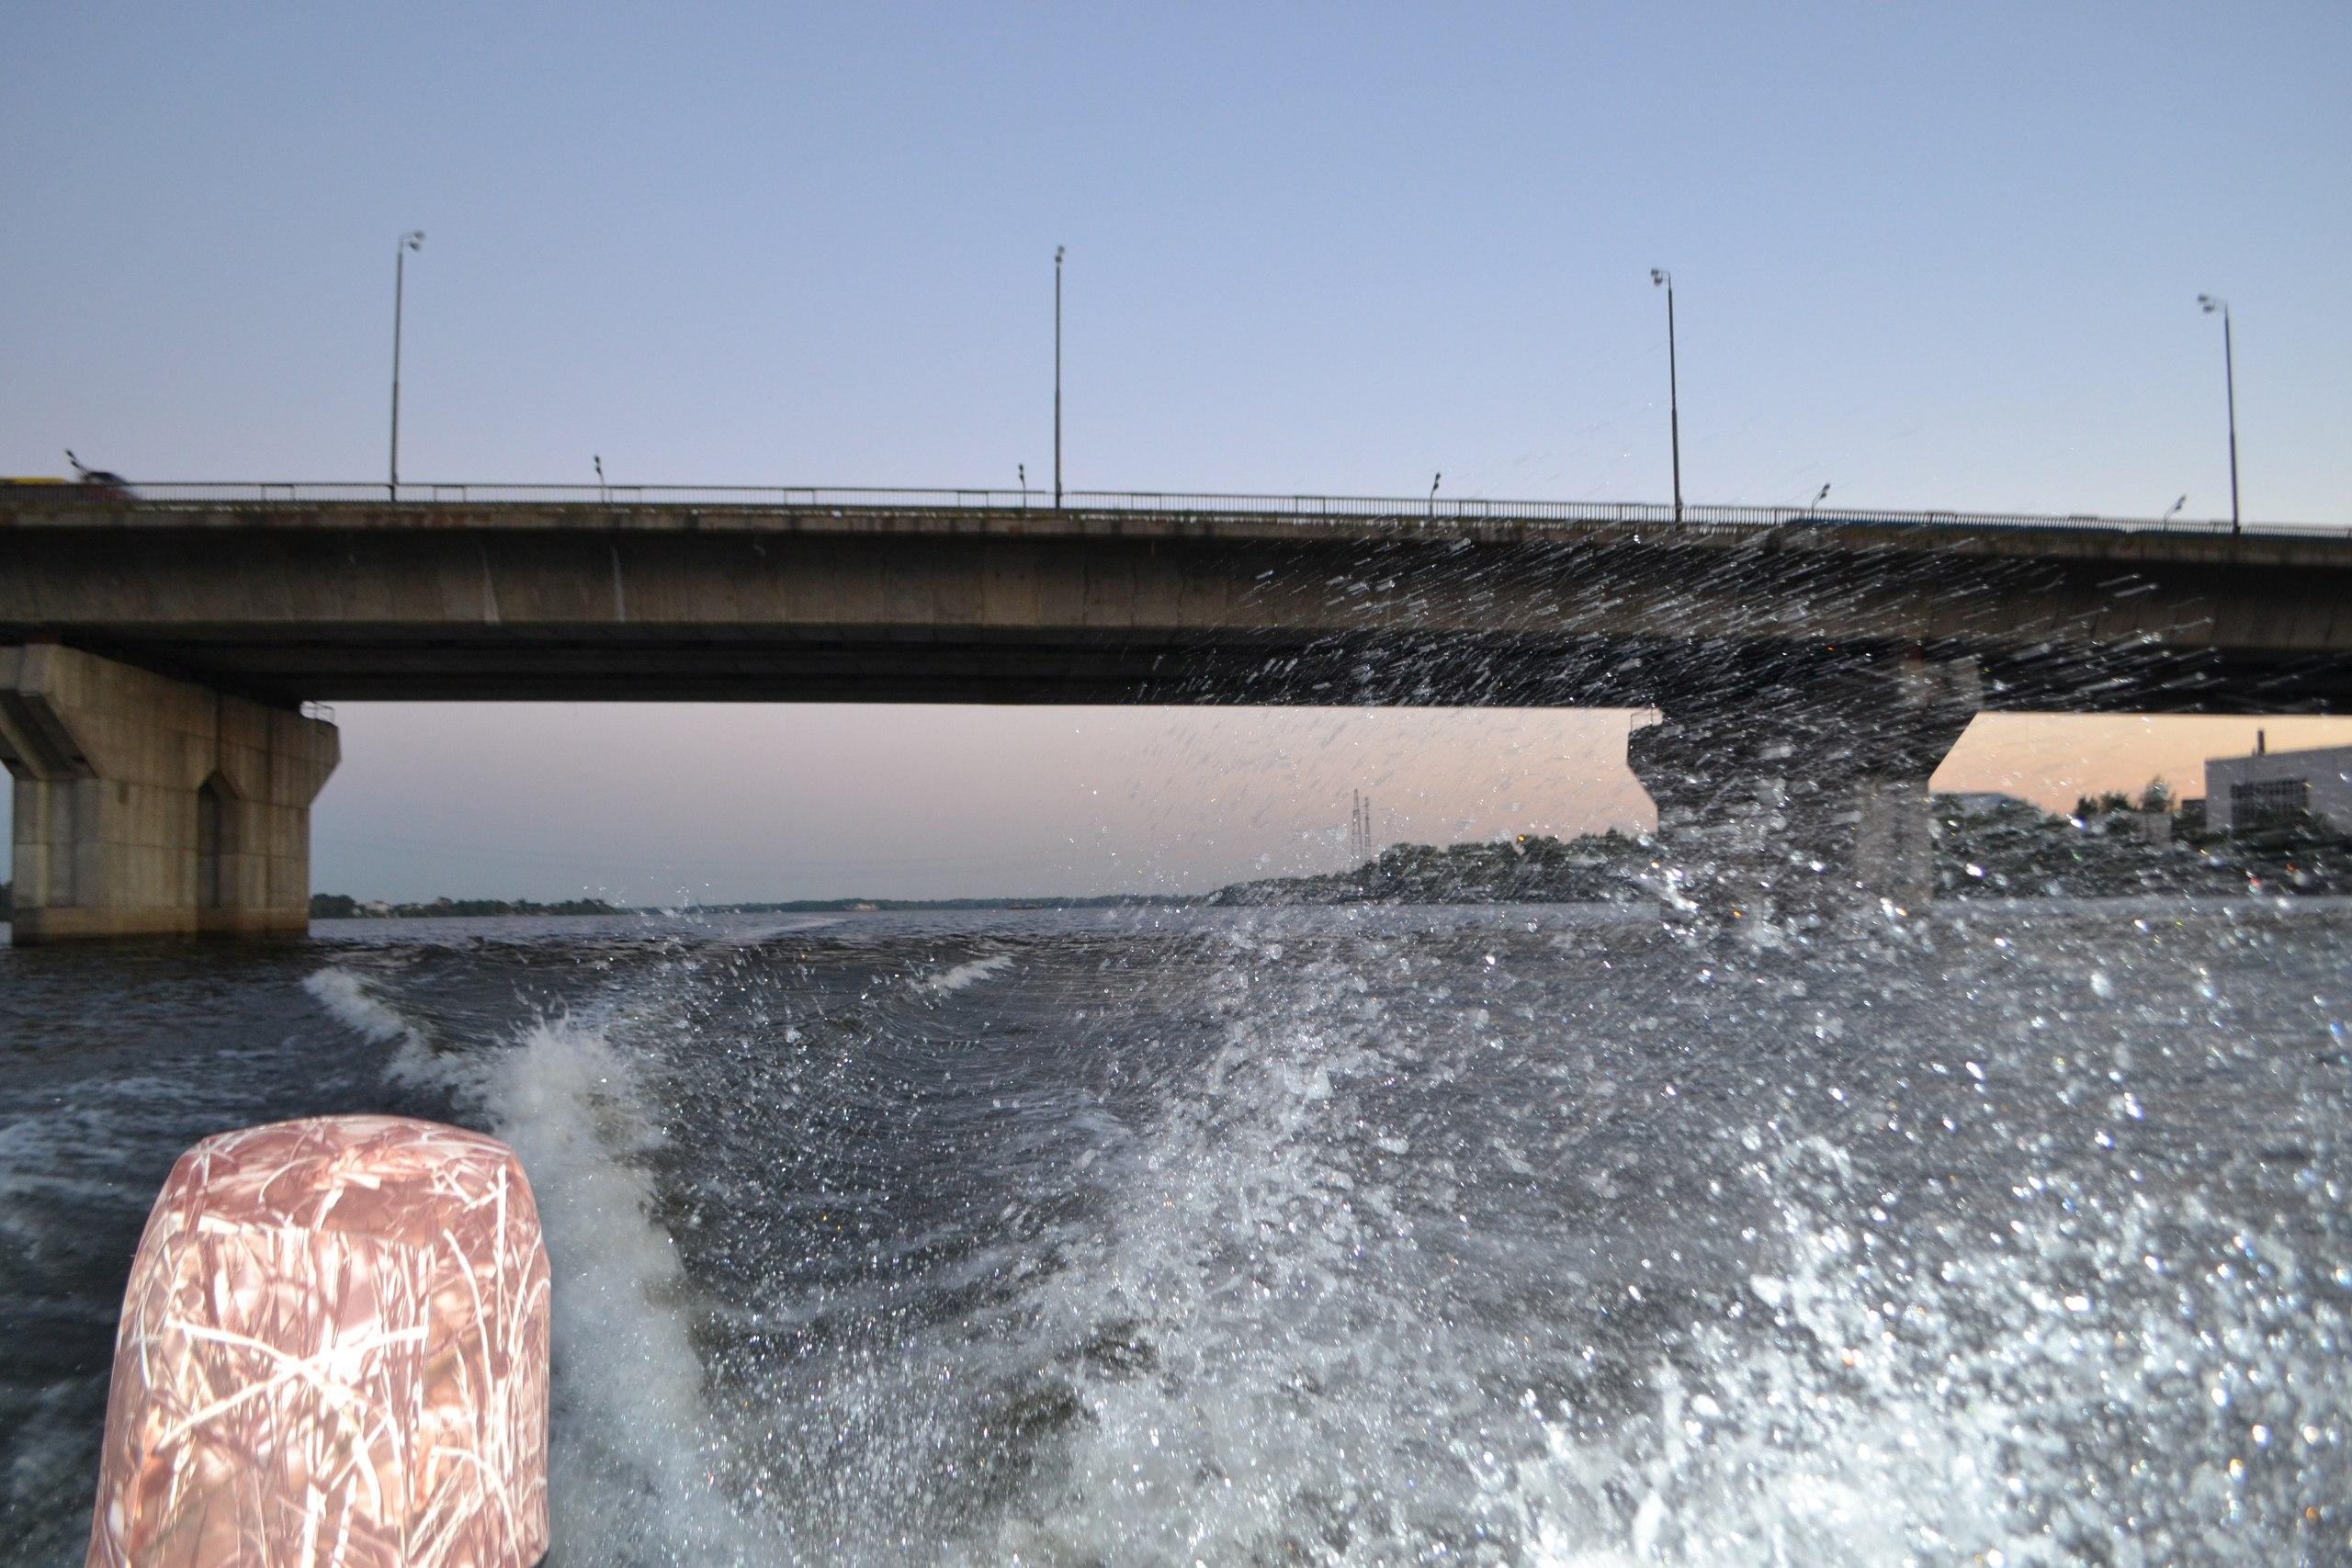 Елена Руденко Охота на водоплавающую дичь ( Украинка. 24-25 августа. 2016 г.) - Страница 3 K5sC6Laz2PA